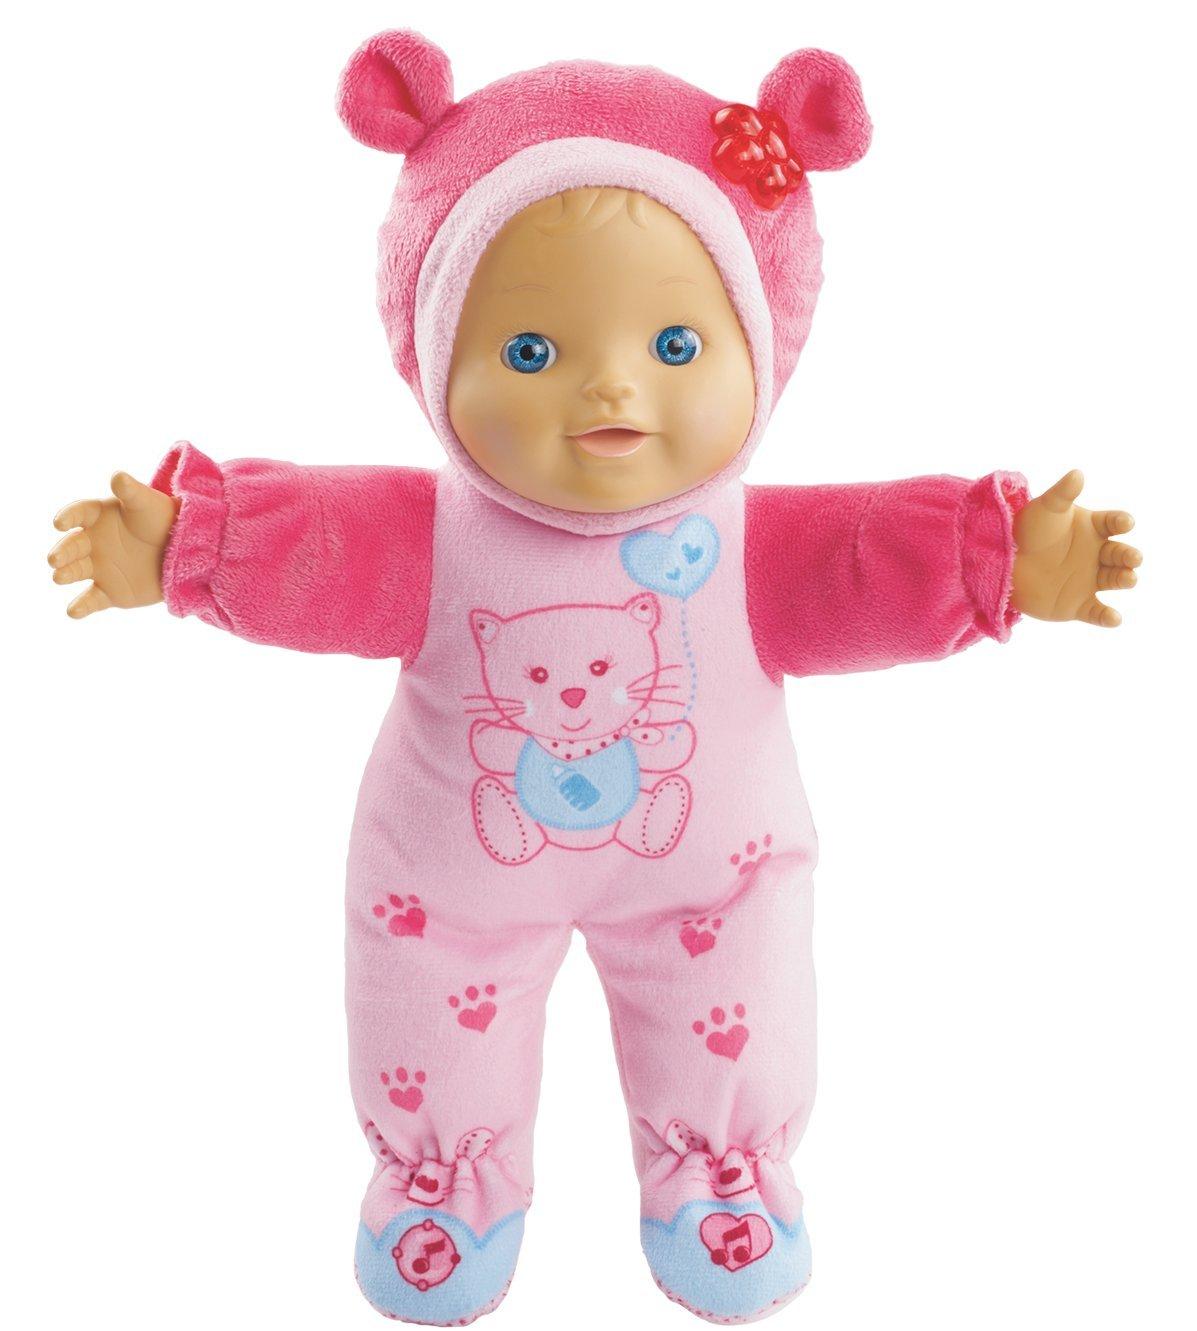 VTech 80-169404 – Little Love – Lena will spielen, Babypuppe als Weihnachtsgeschenk